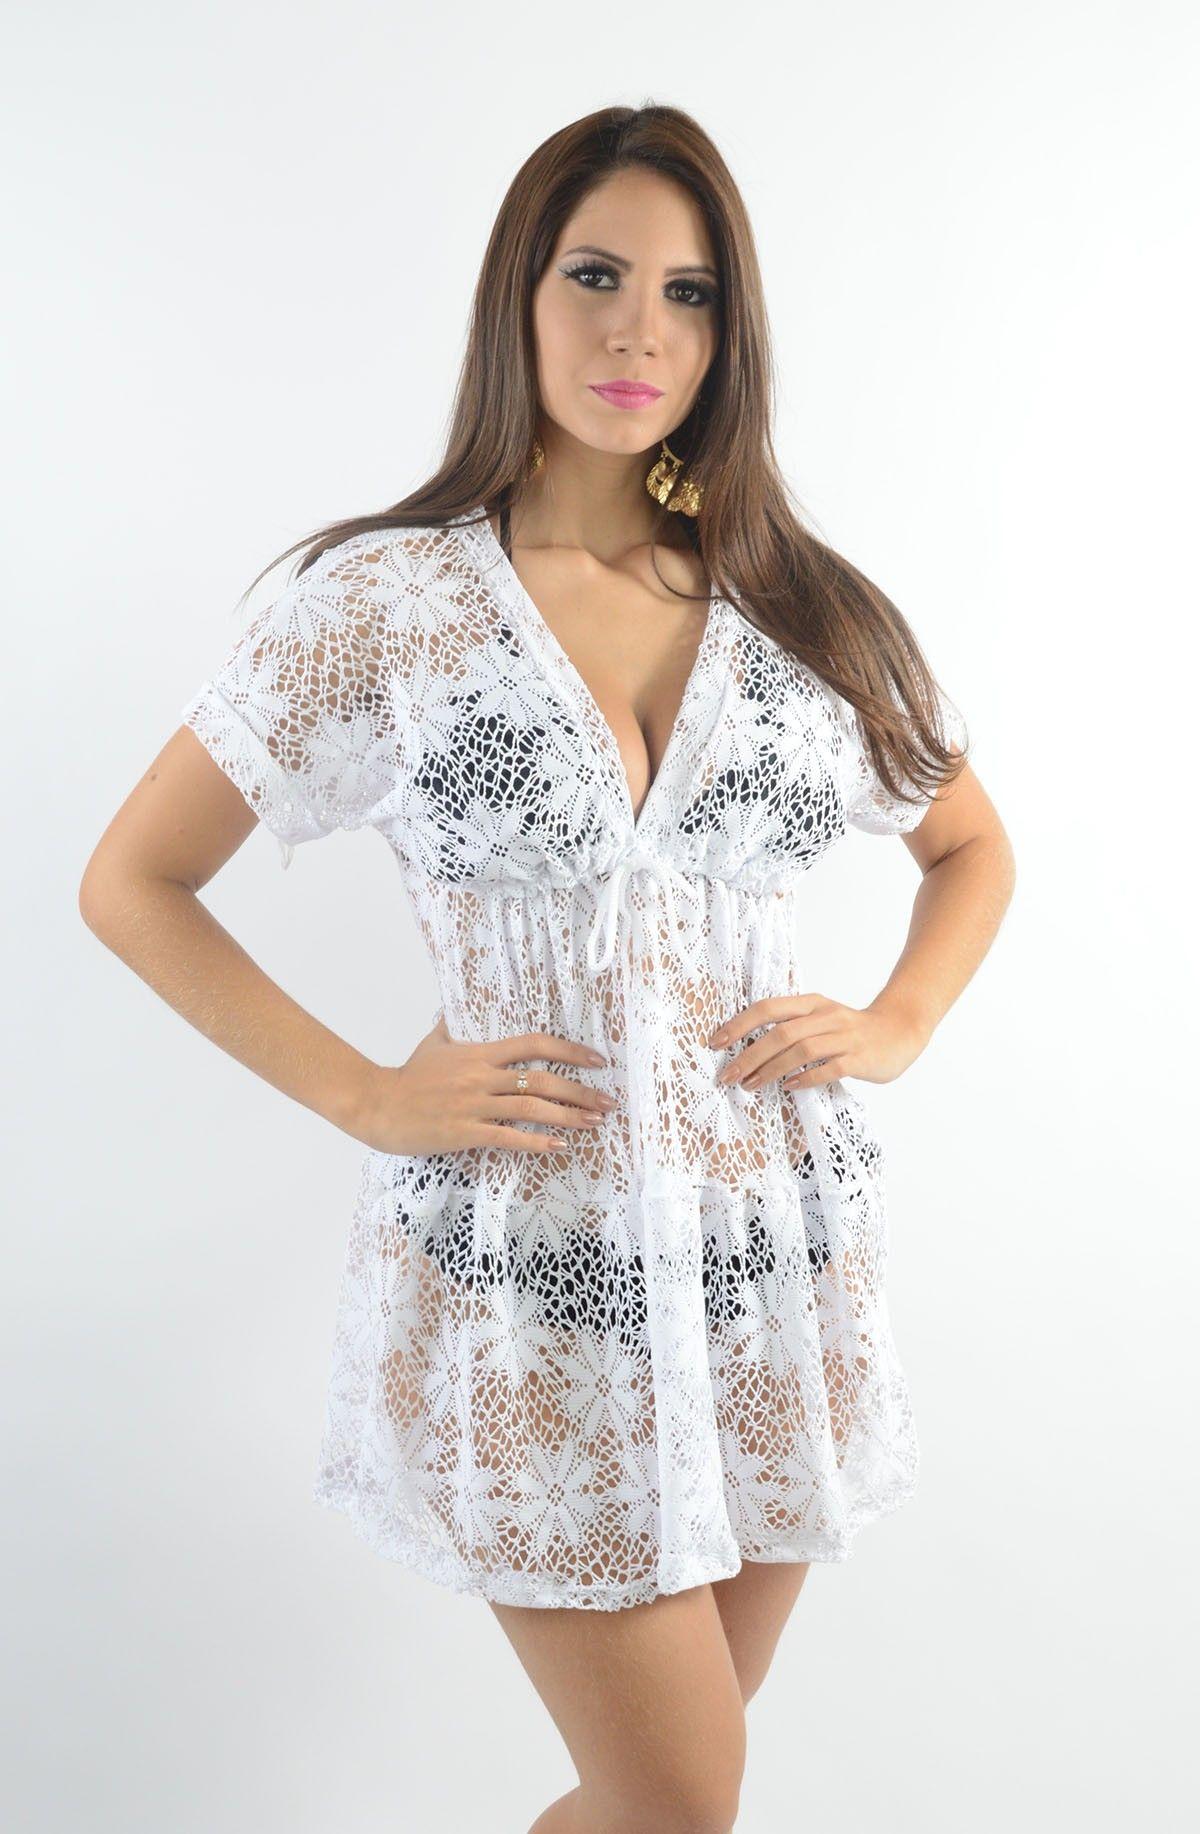 Mulher Procura Homem Para Gravidez Seville-67536